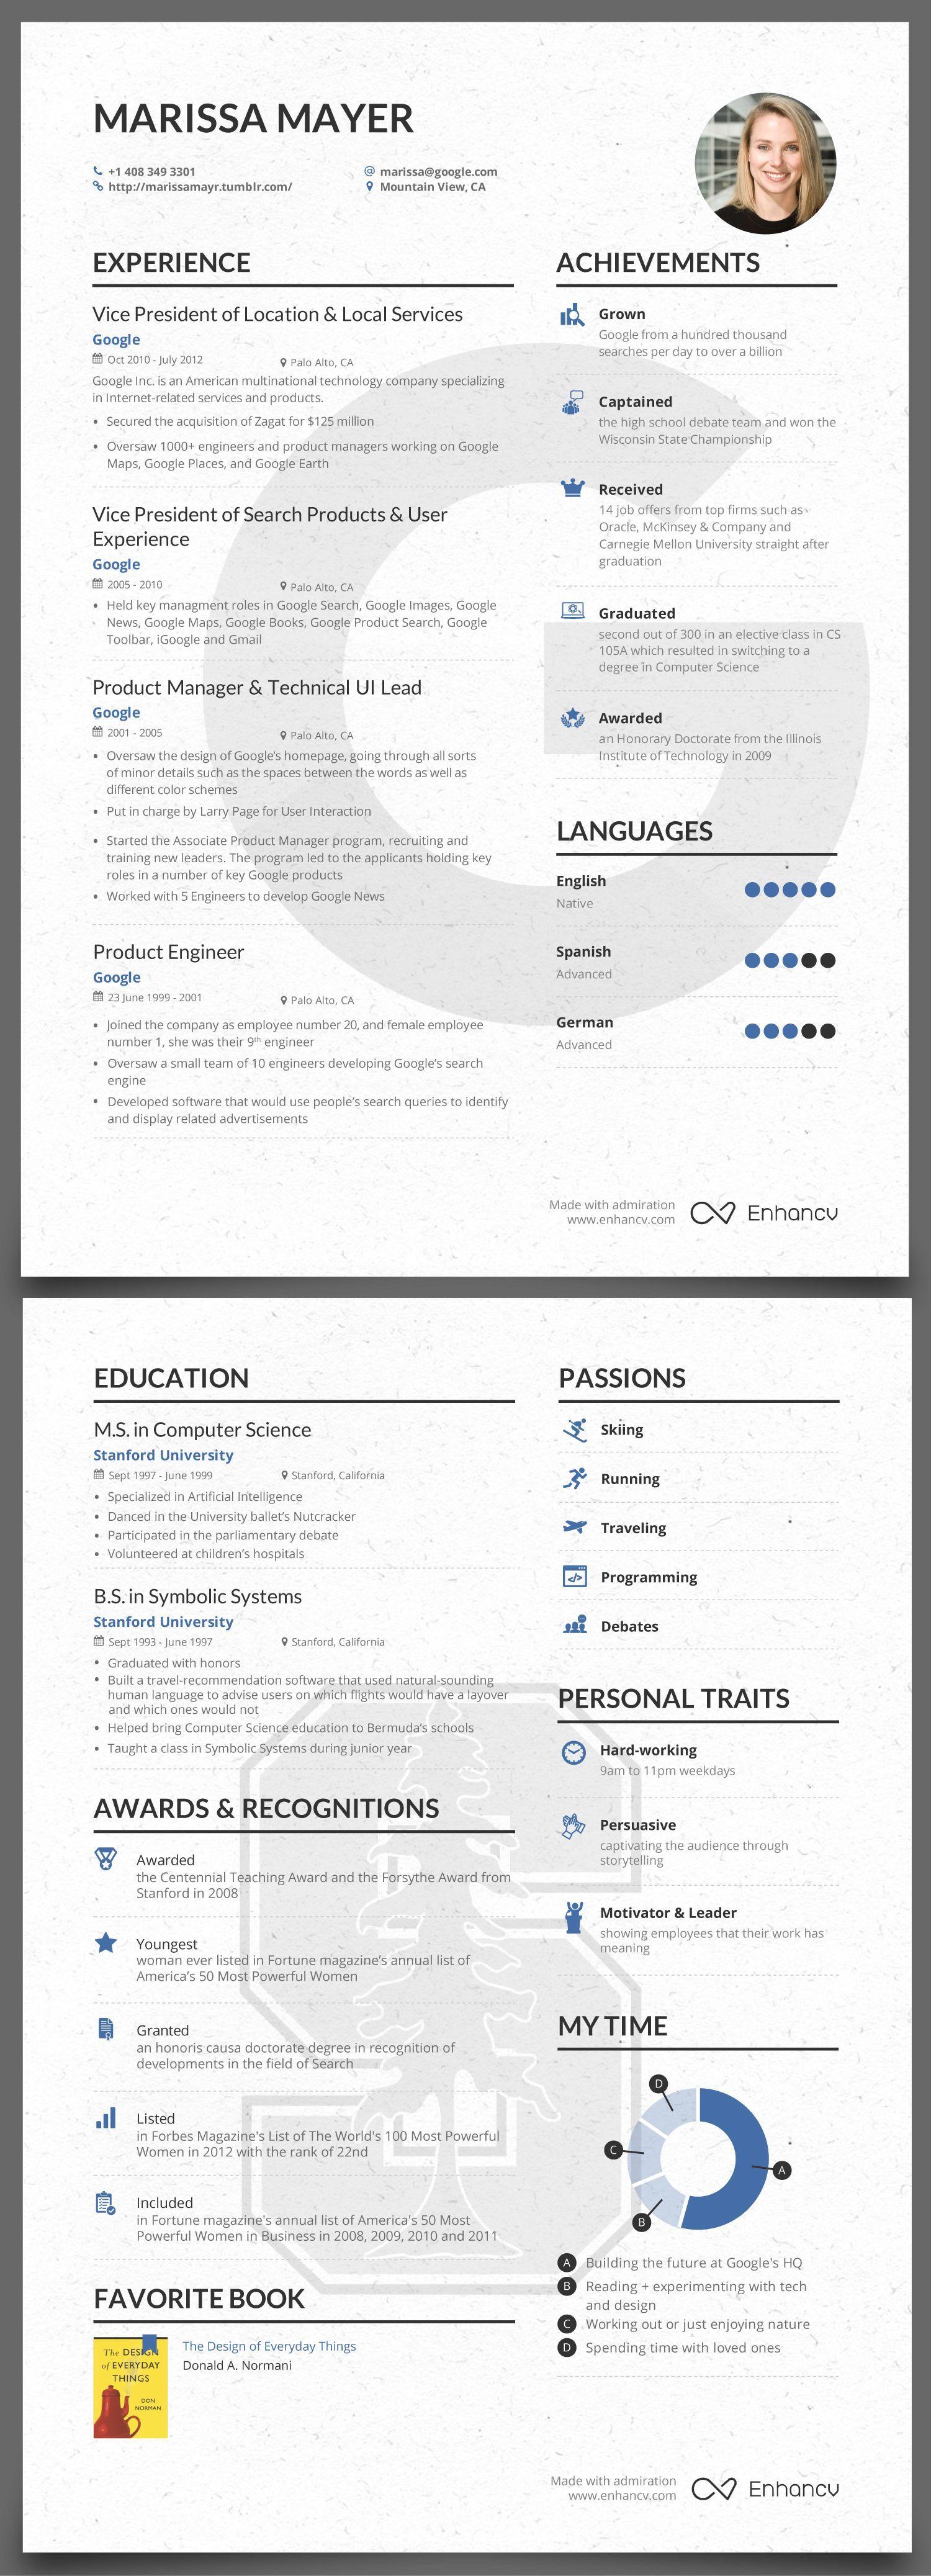 The Success Journey: Marissa Mayer\'s Pre-Yahoo Resume | Currículum ...